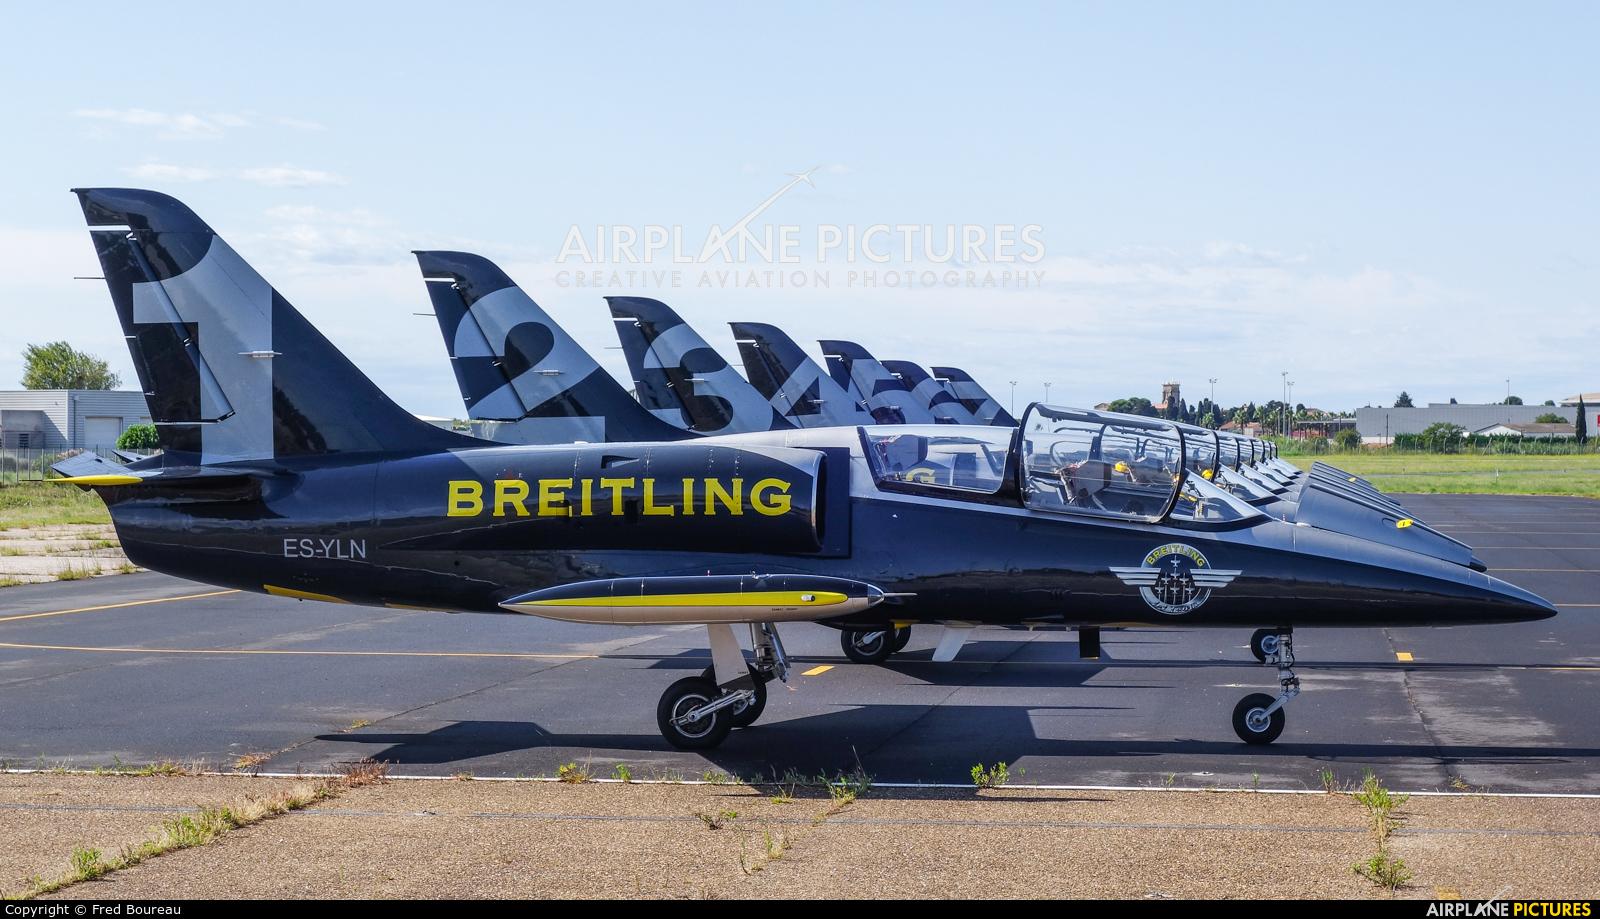 Breitling Jet Team ES-YLN aircraft at Montpellier-Méditerranée